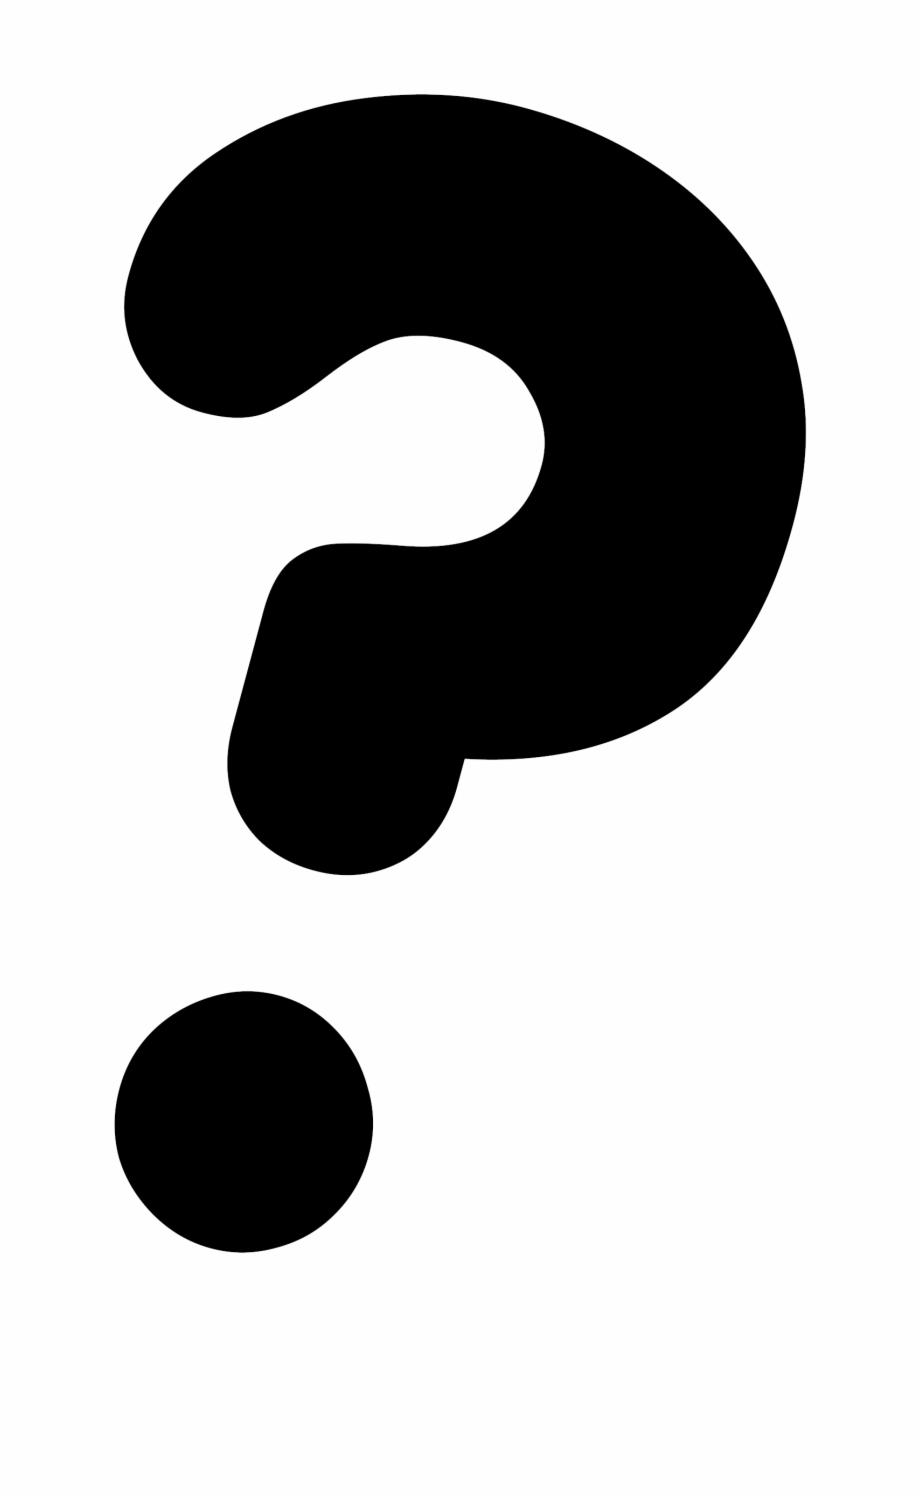 Questions question mark.